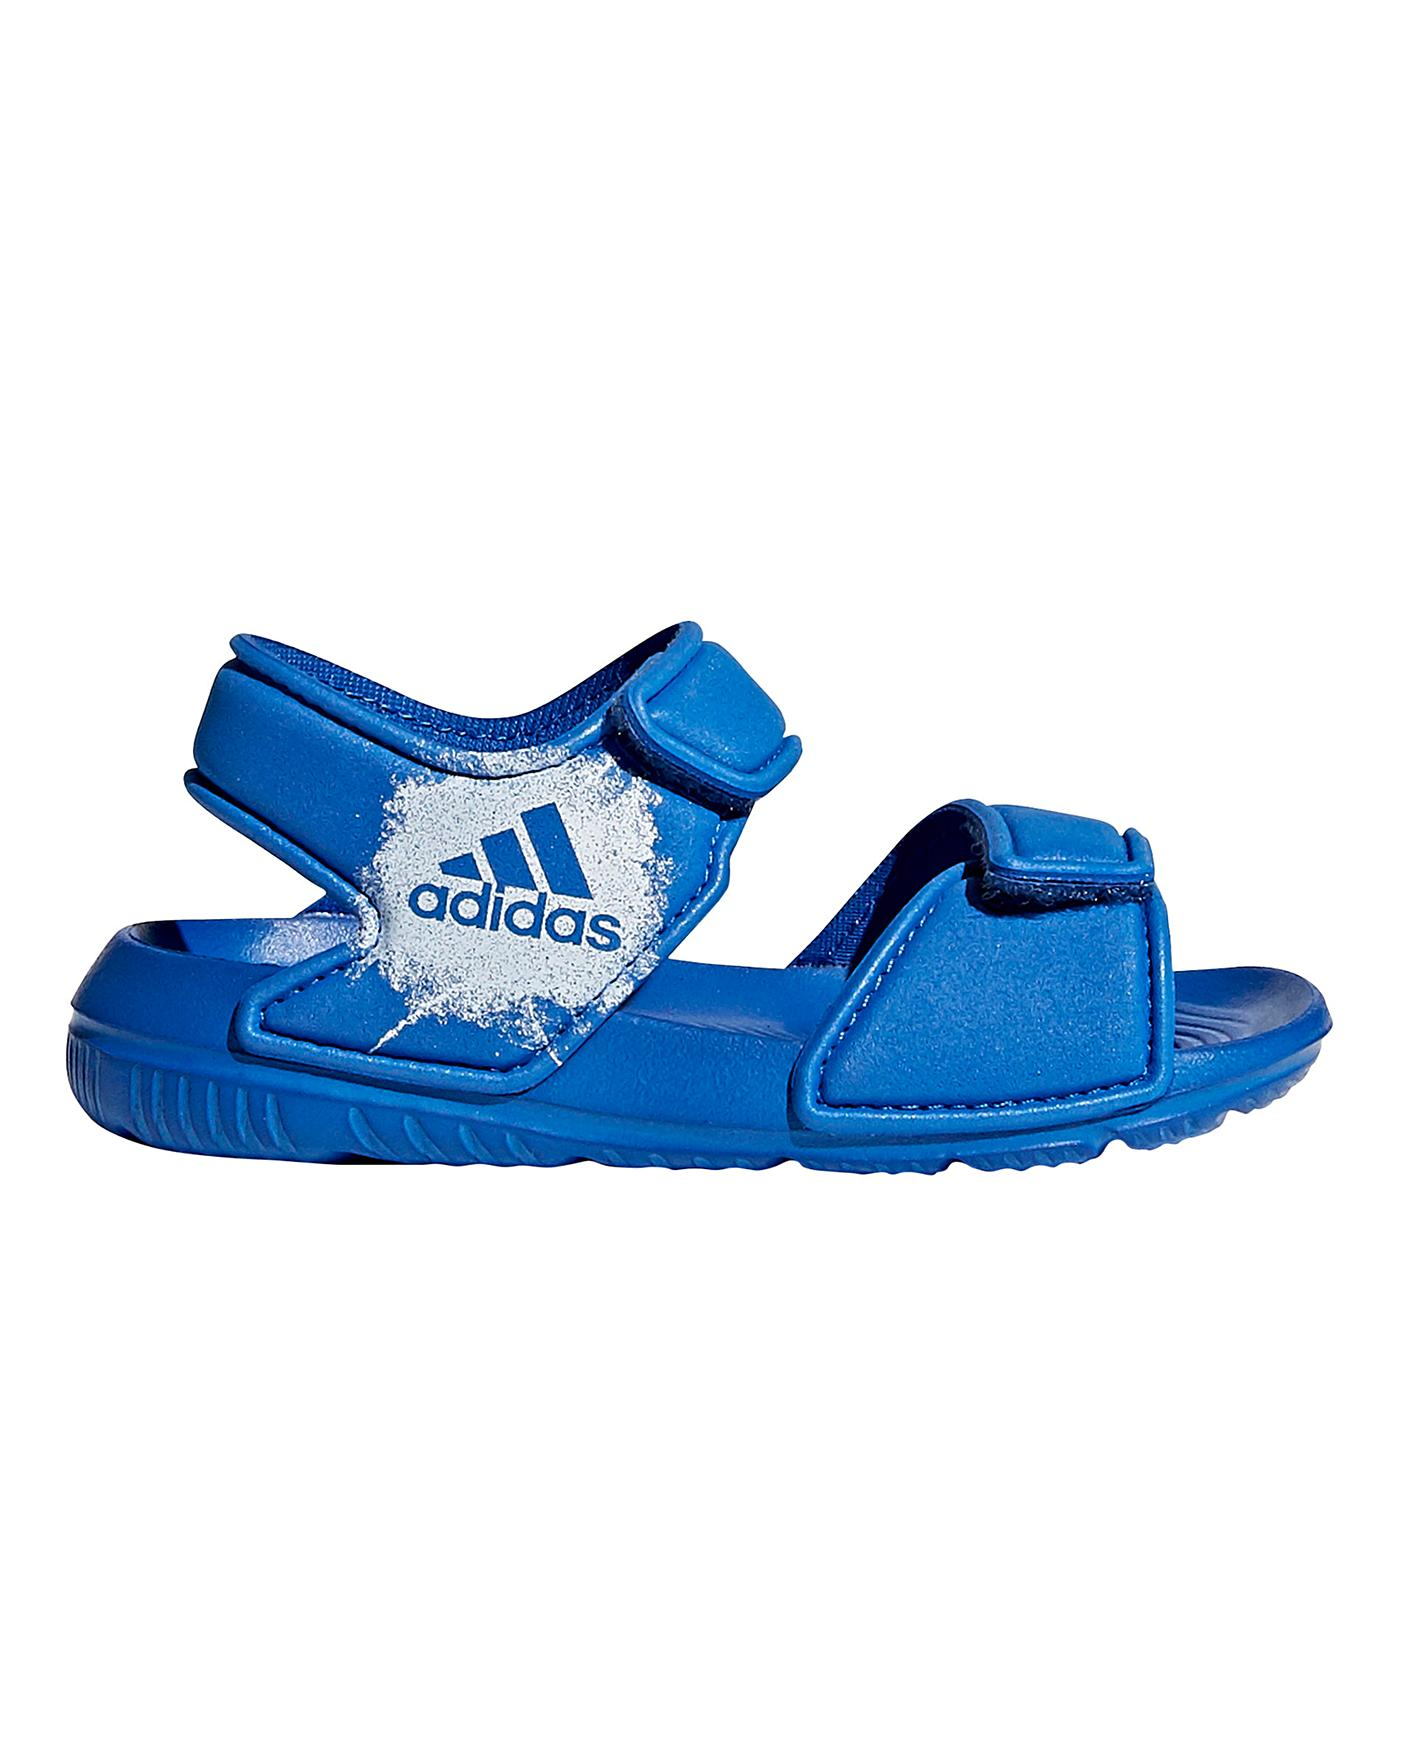 adidas Alta Swim Infants Sandals   J D